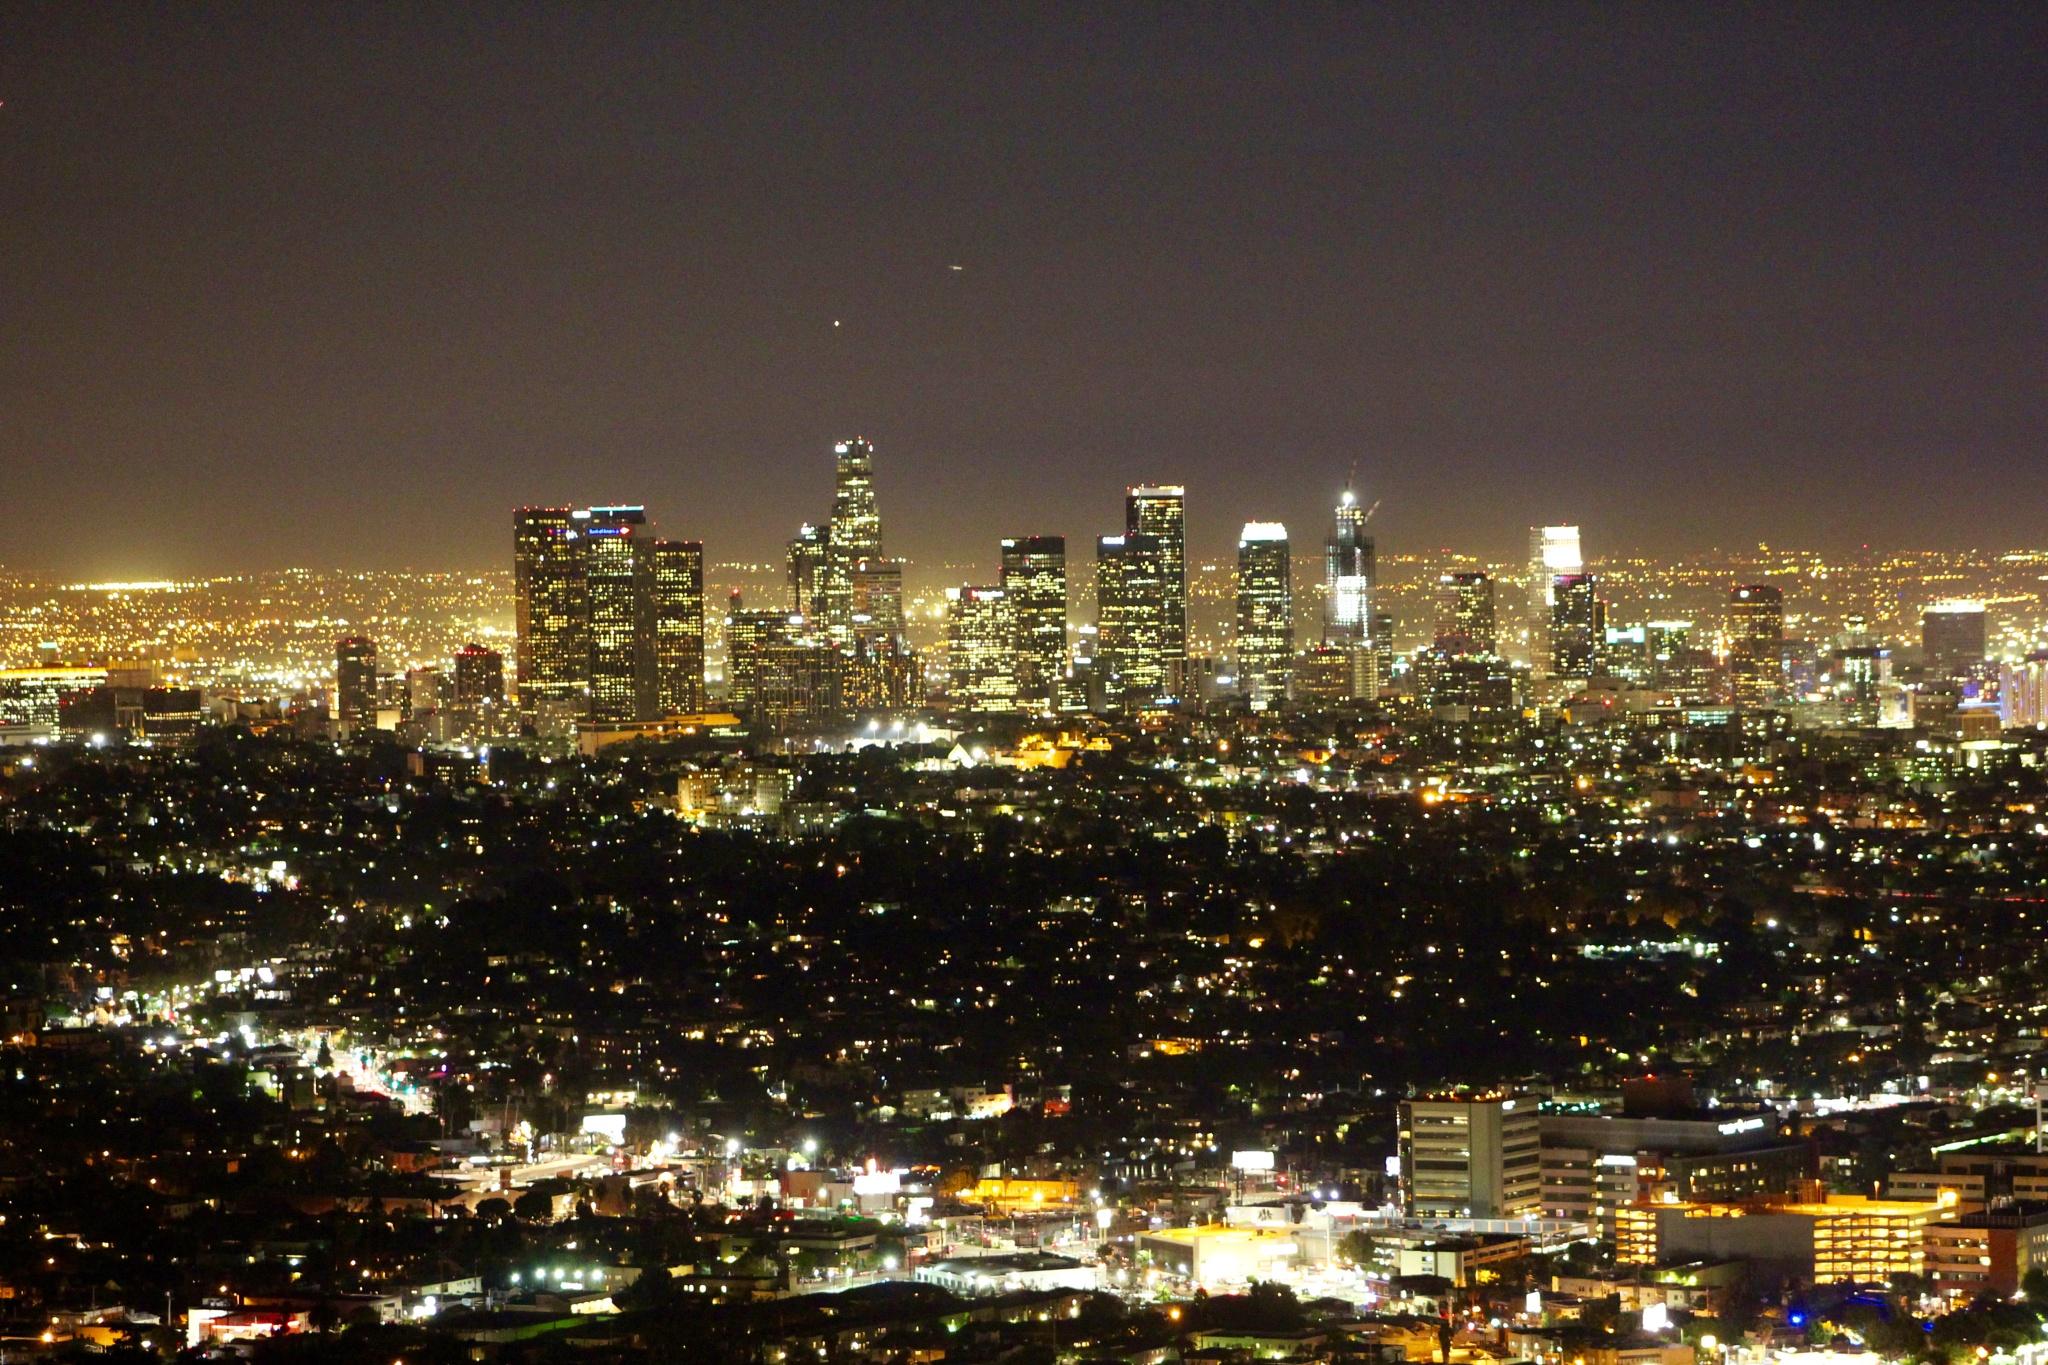 Los Angeles at night by Leunam Acevedo